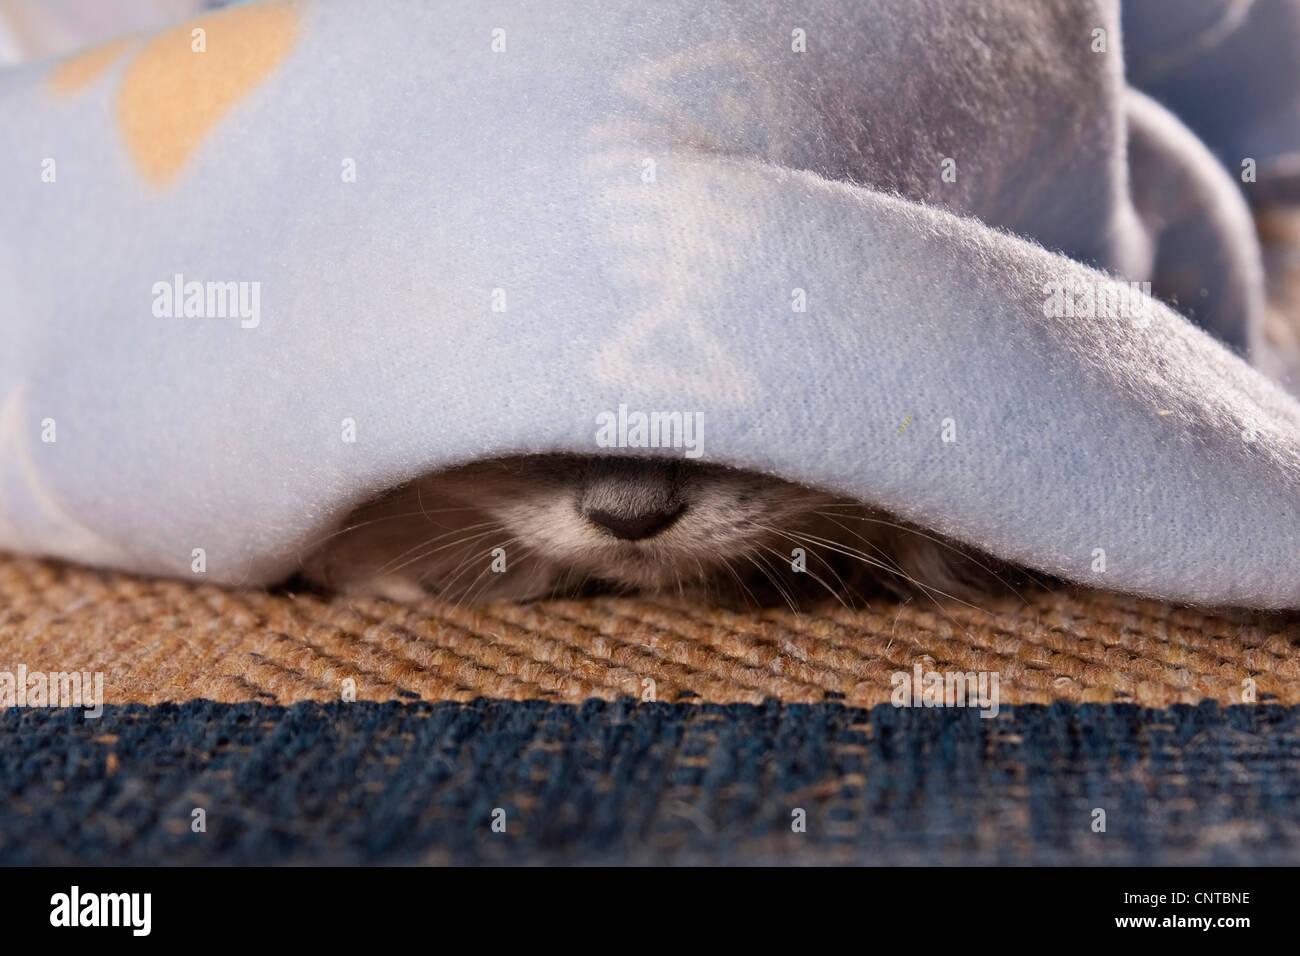 domestic cat, house cat (Felis silvestris f. catus), nose of a cat under a blanket Stock Photo